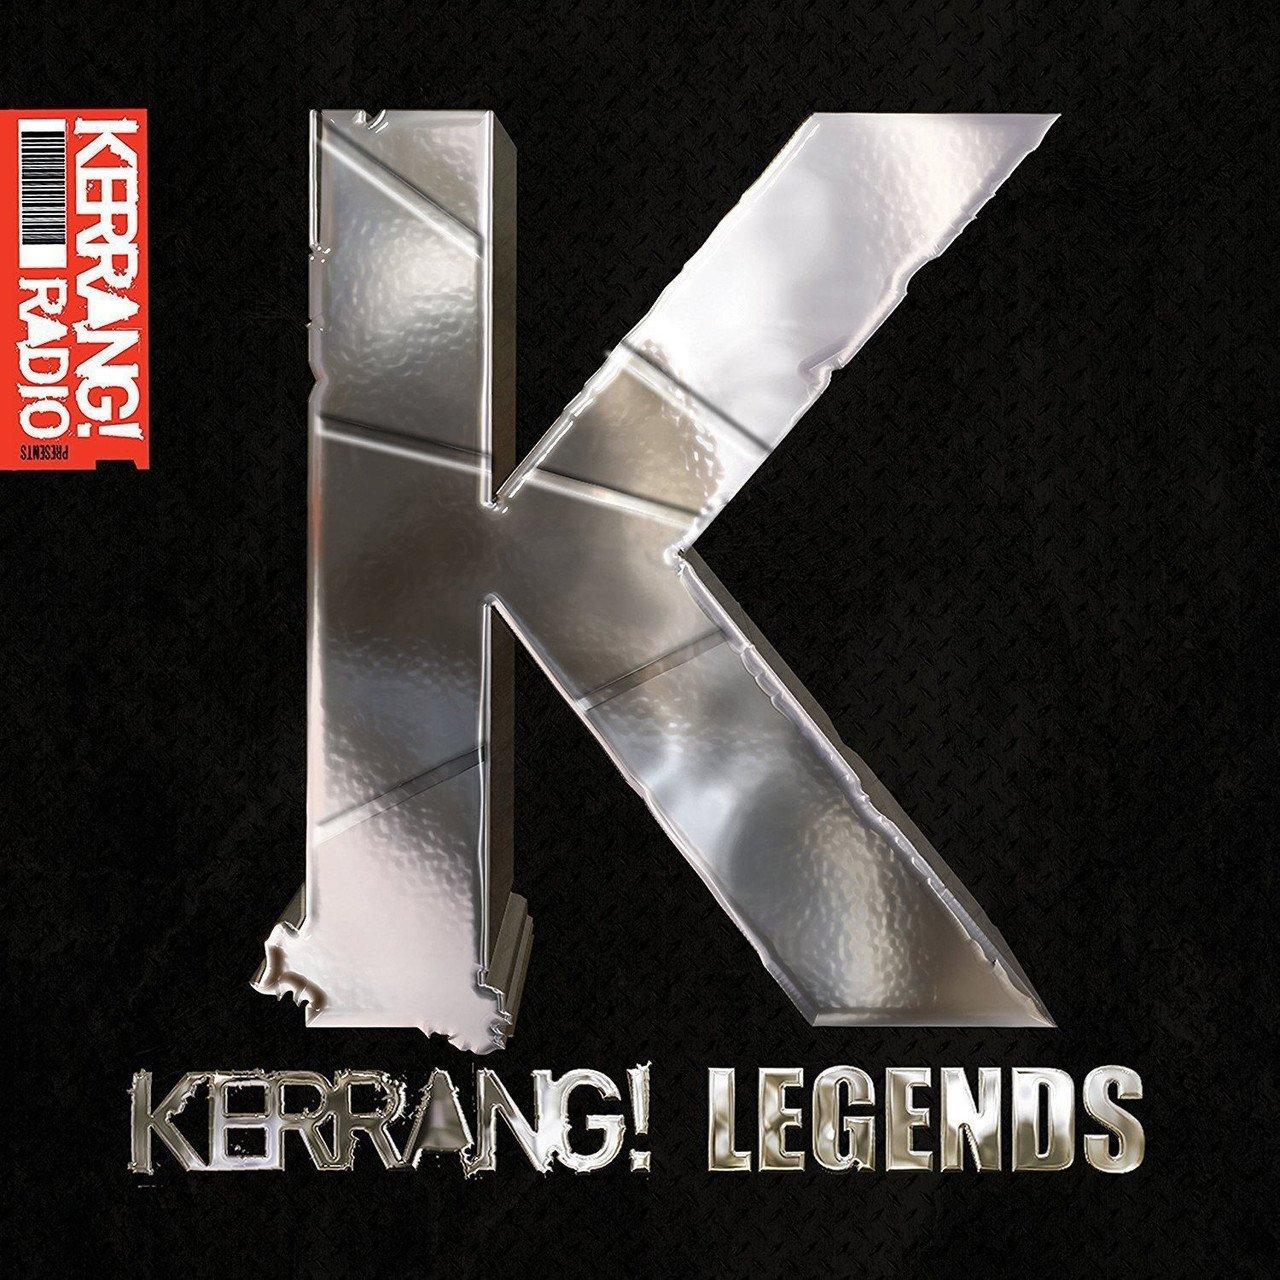 Сборник - Legends! Alternative Rock Legends (2xVinyl, LP)